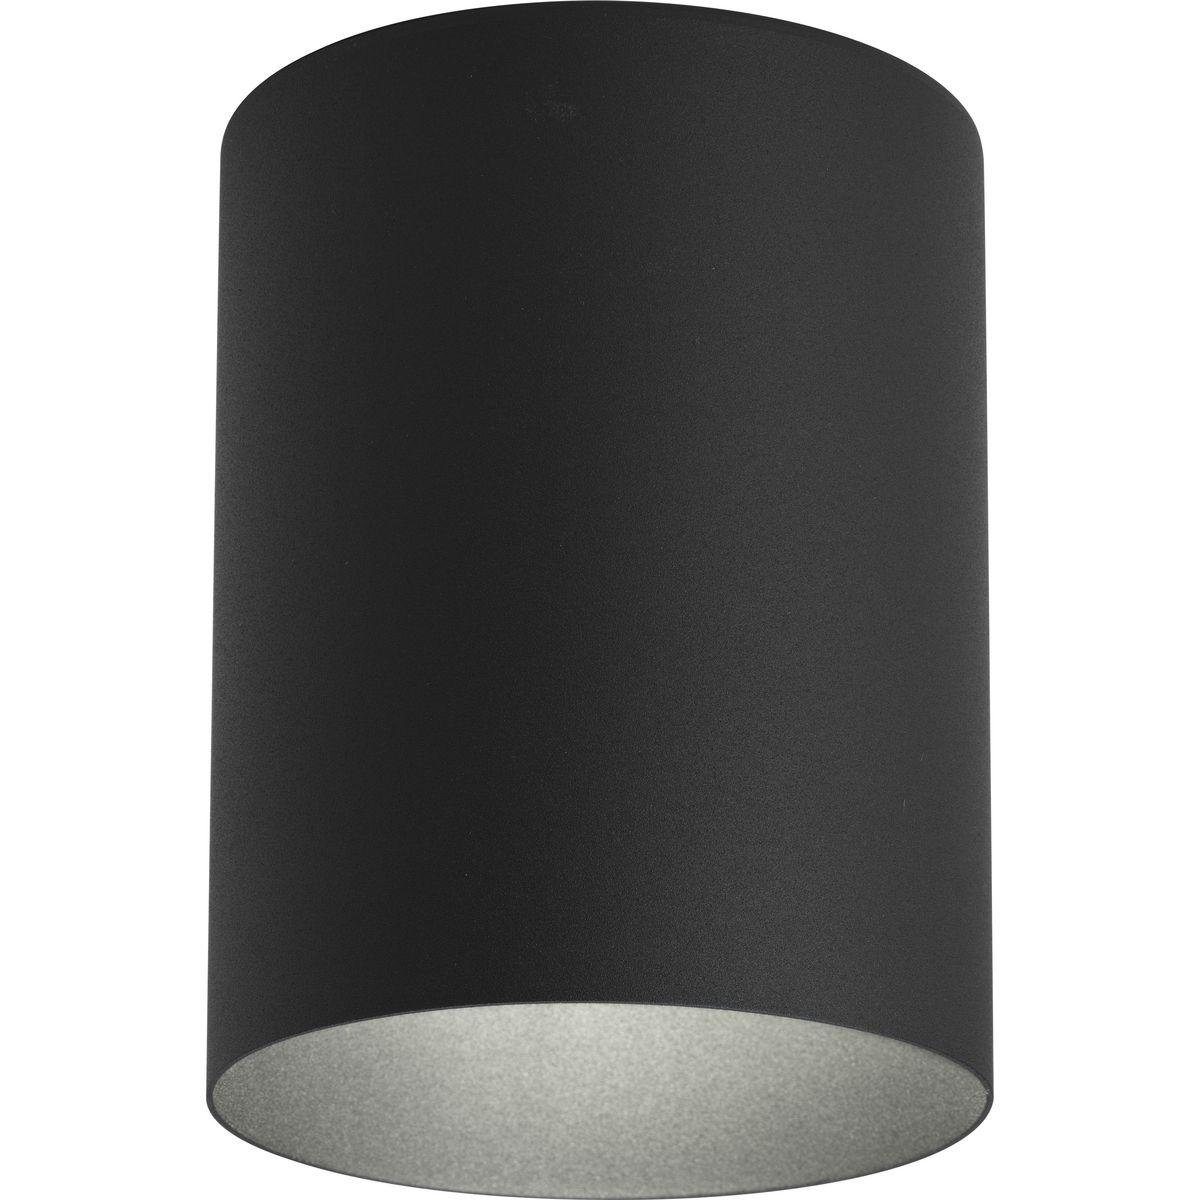 5 Black Outdoor Ceiling Mount Cylinder P5774 31 Progress Lighting